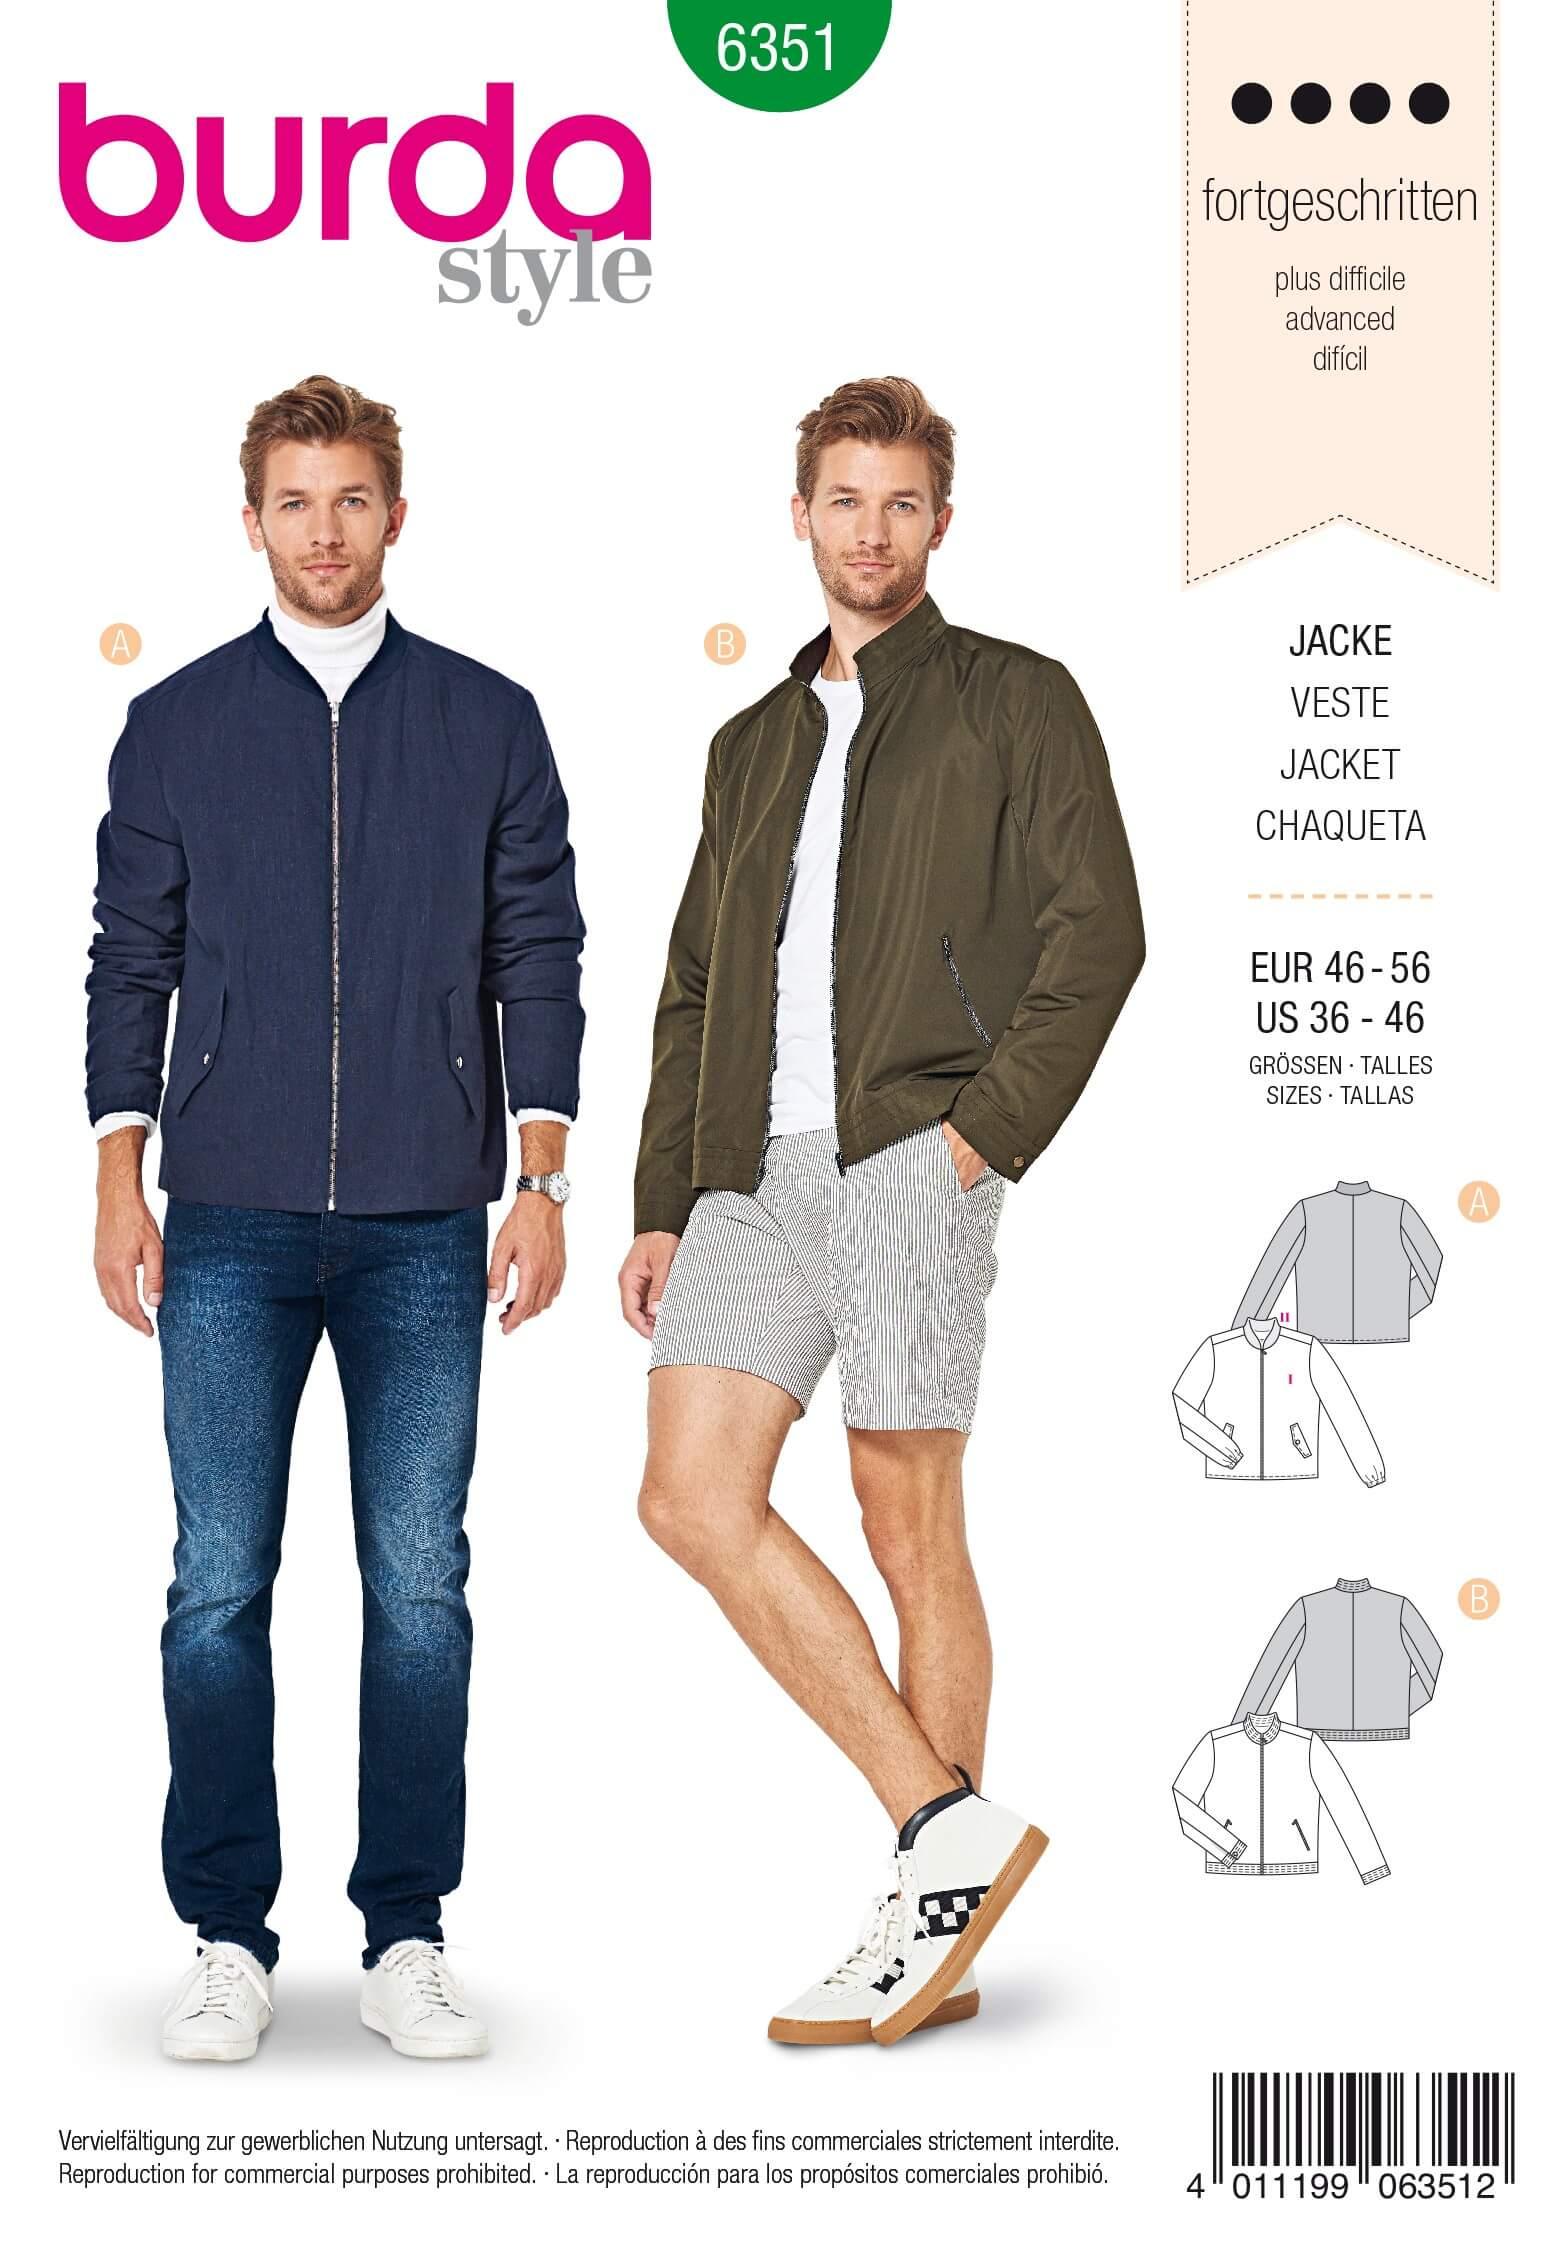 Burda Men's Blouson Jacket Coat Outdoor Clothing Sewing Pattern 6351